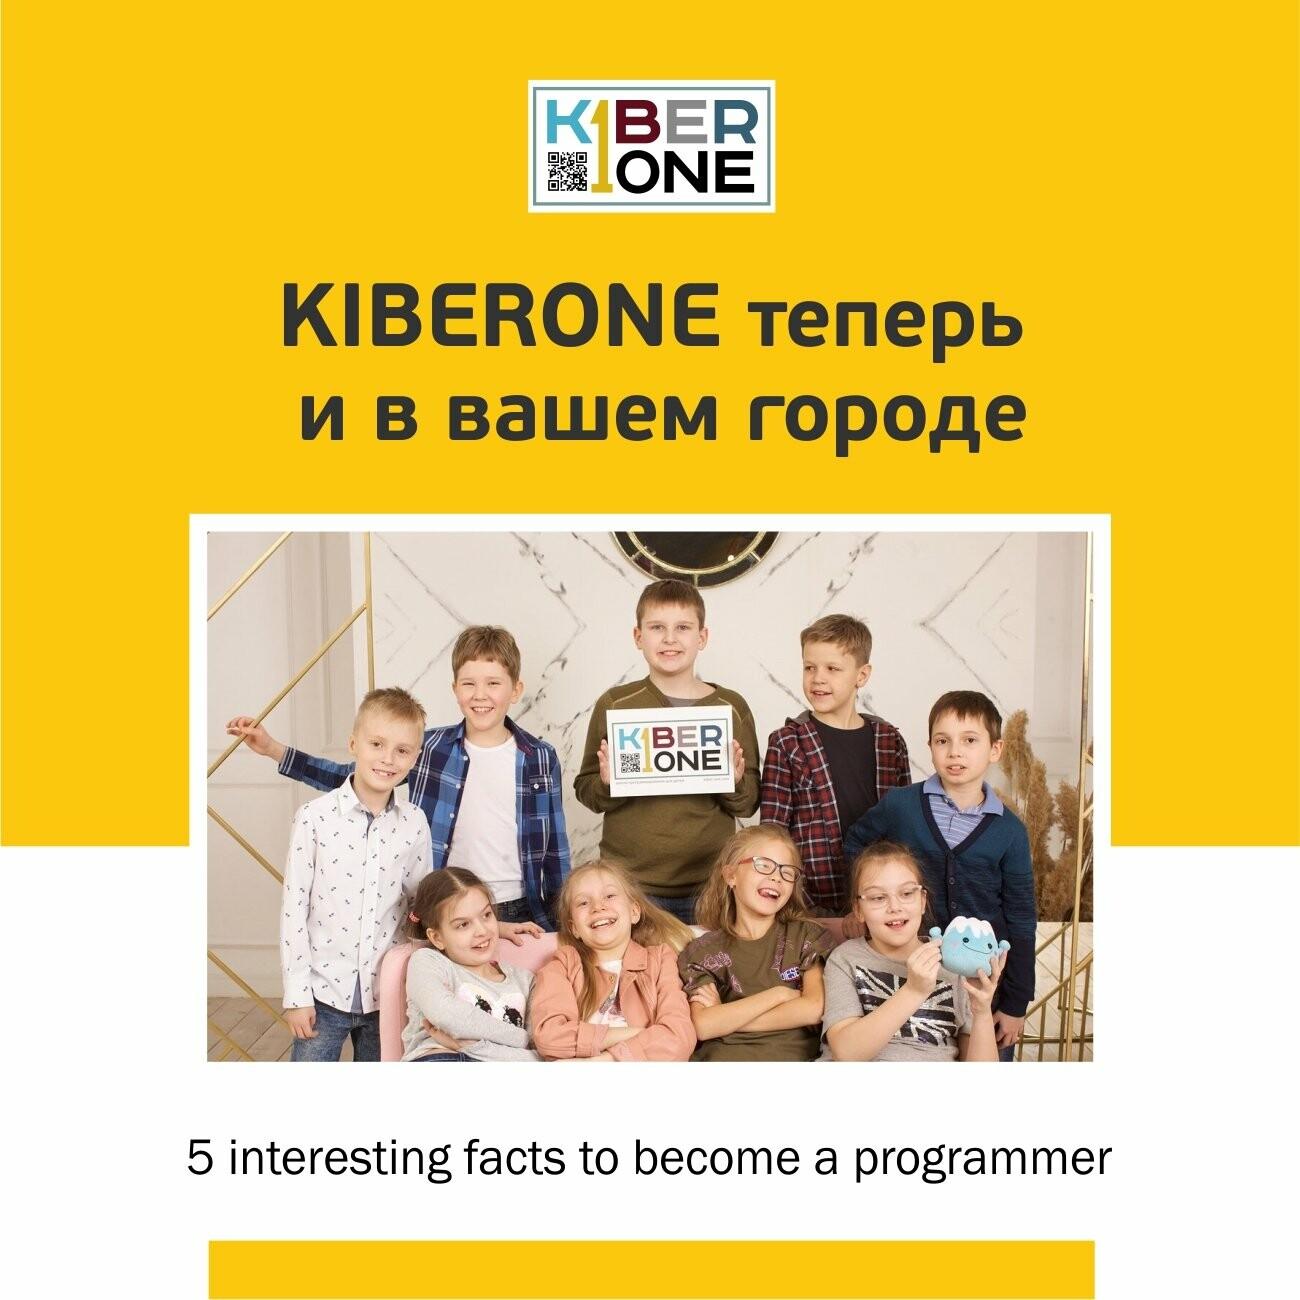 Наконец-то в Ялте - KIBERone  Международная КиберШкола для детей, фото-1